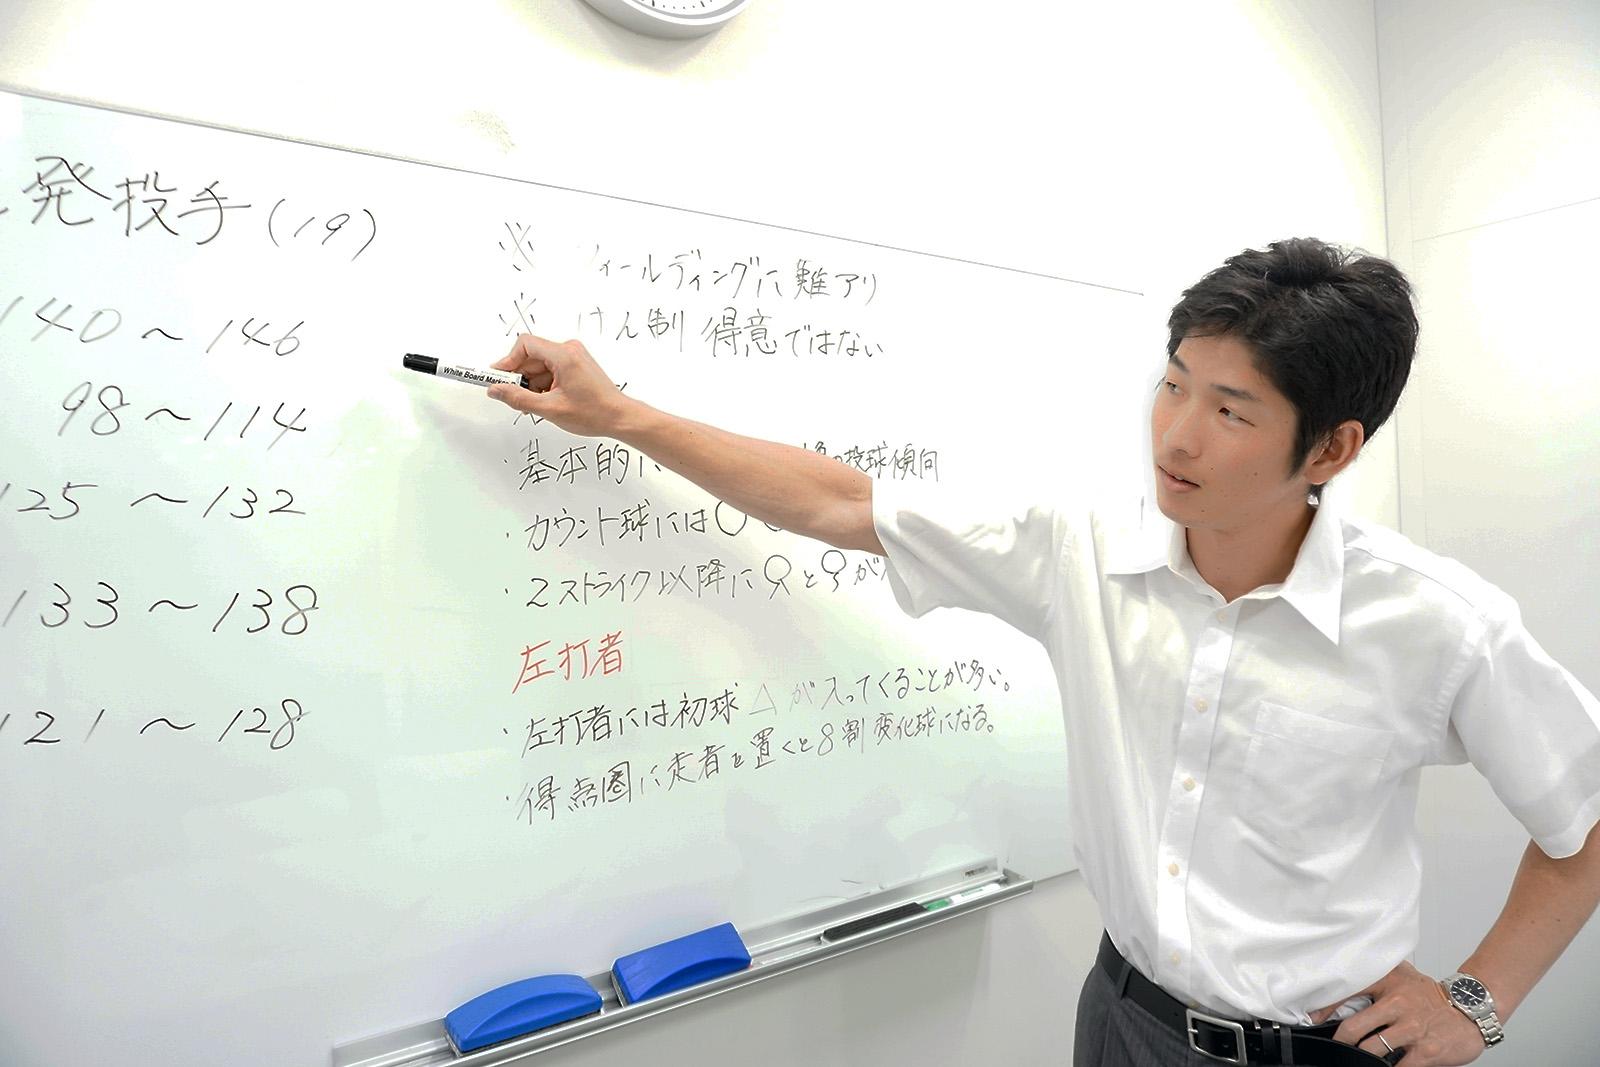 2.whiteboard